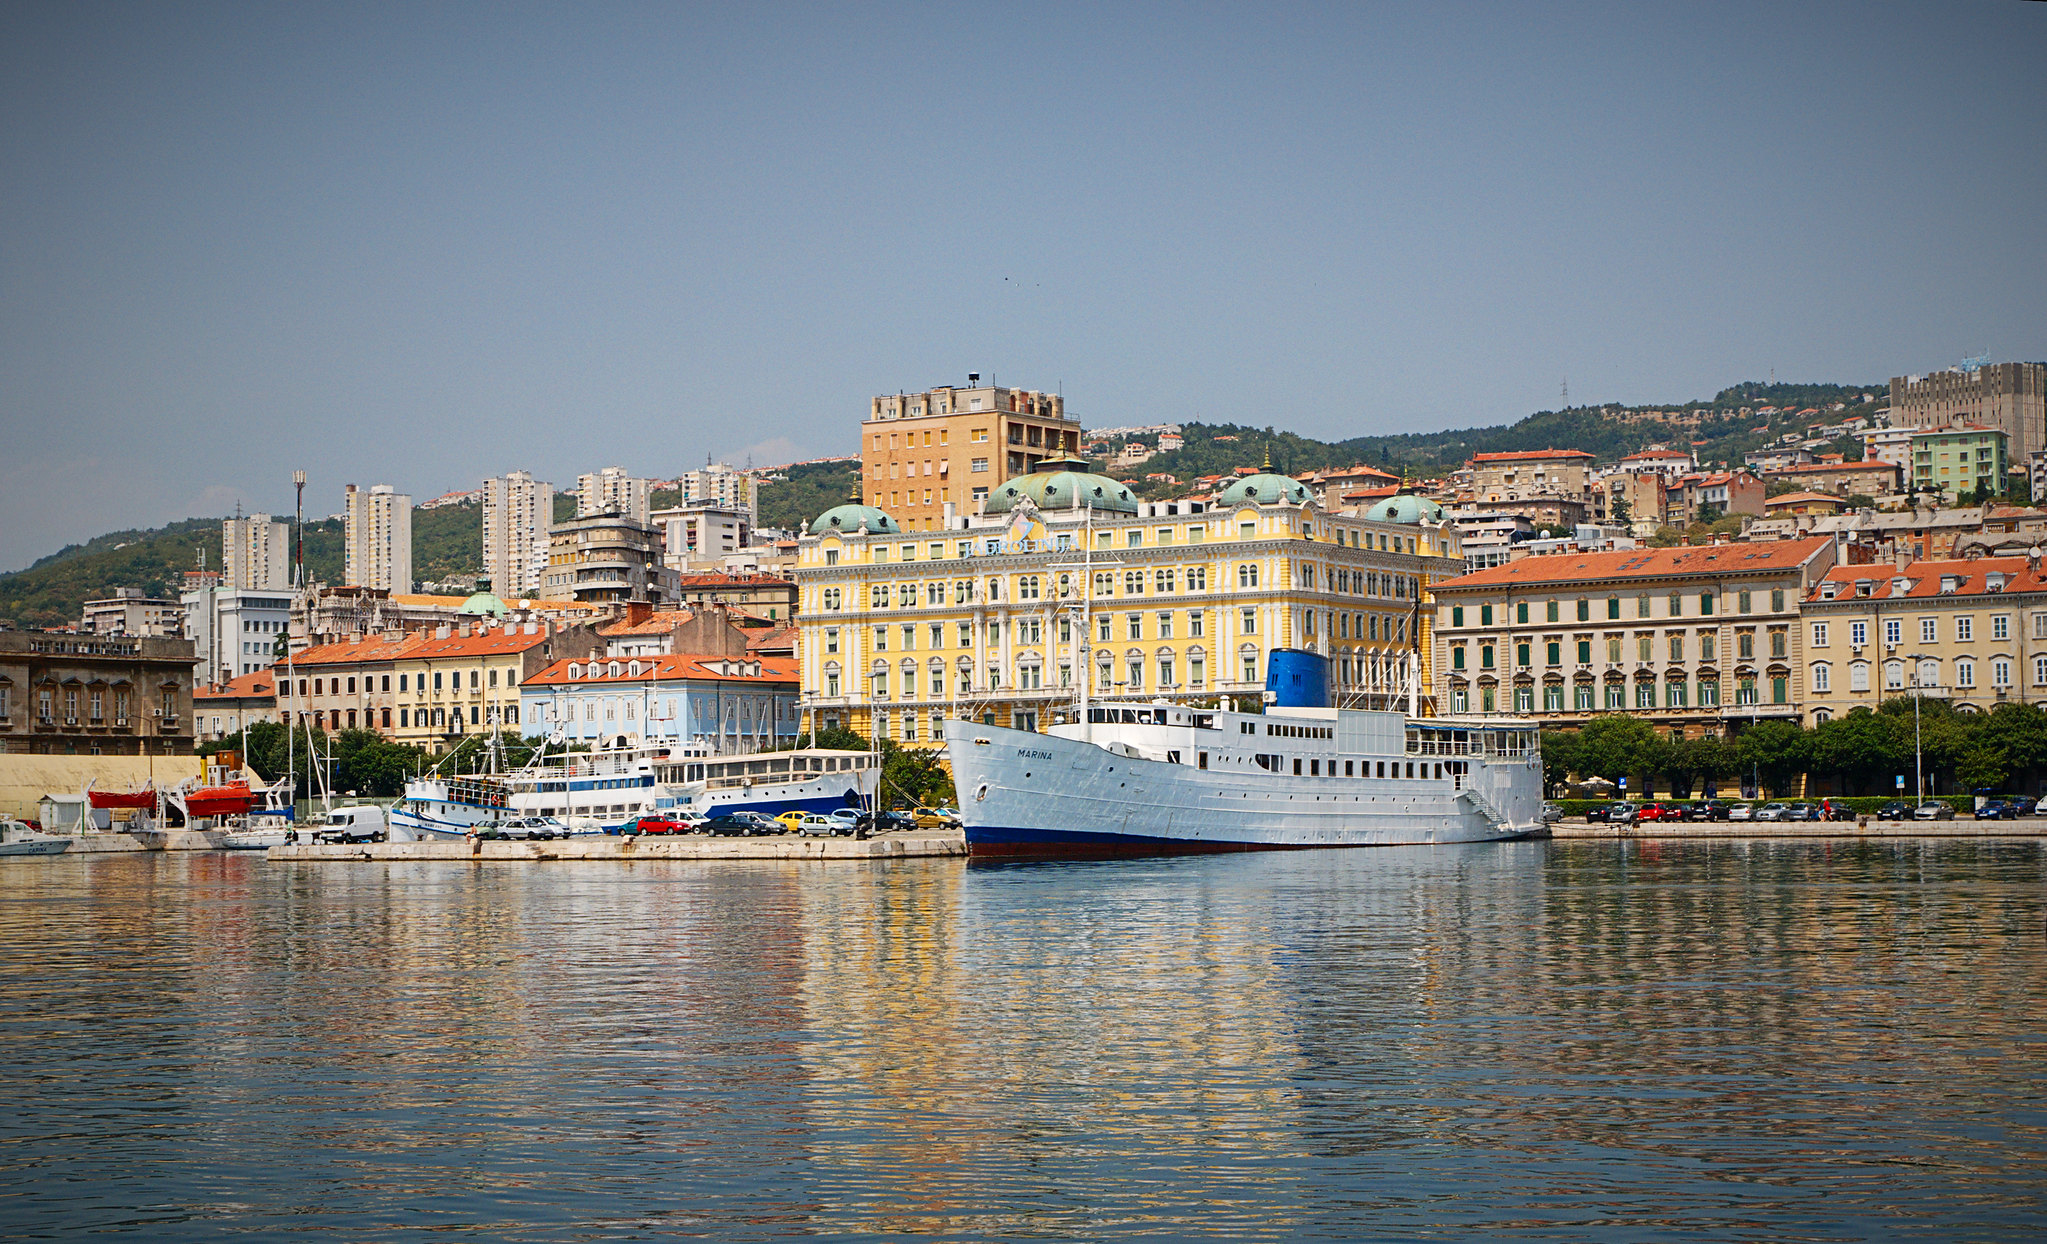 10 Best Things to do in Rijeka, Croatia